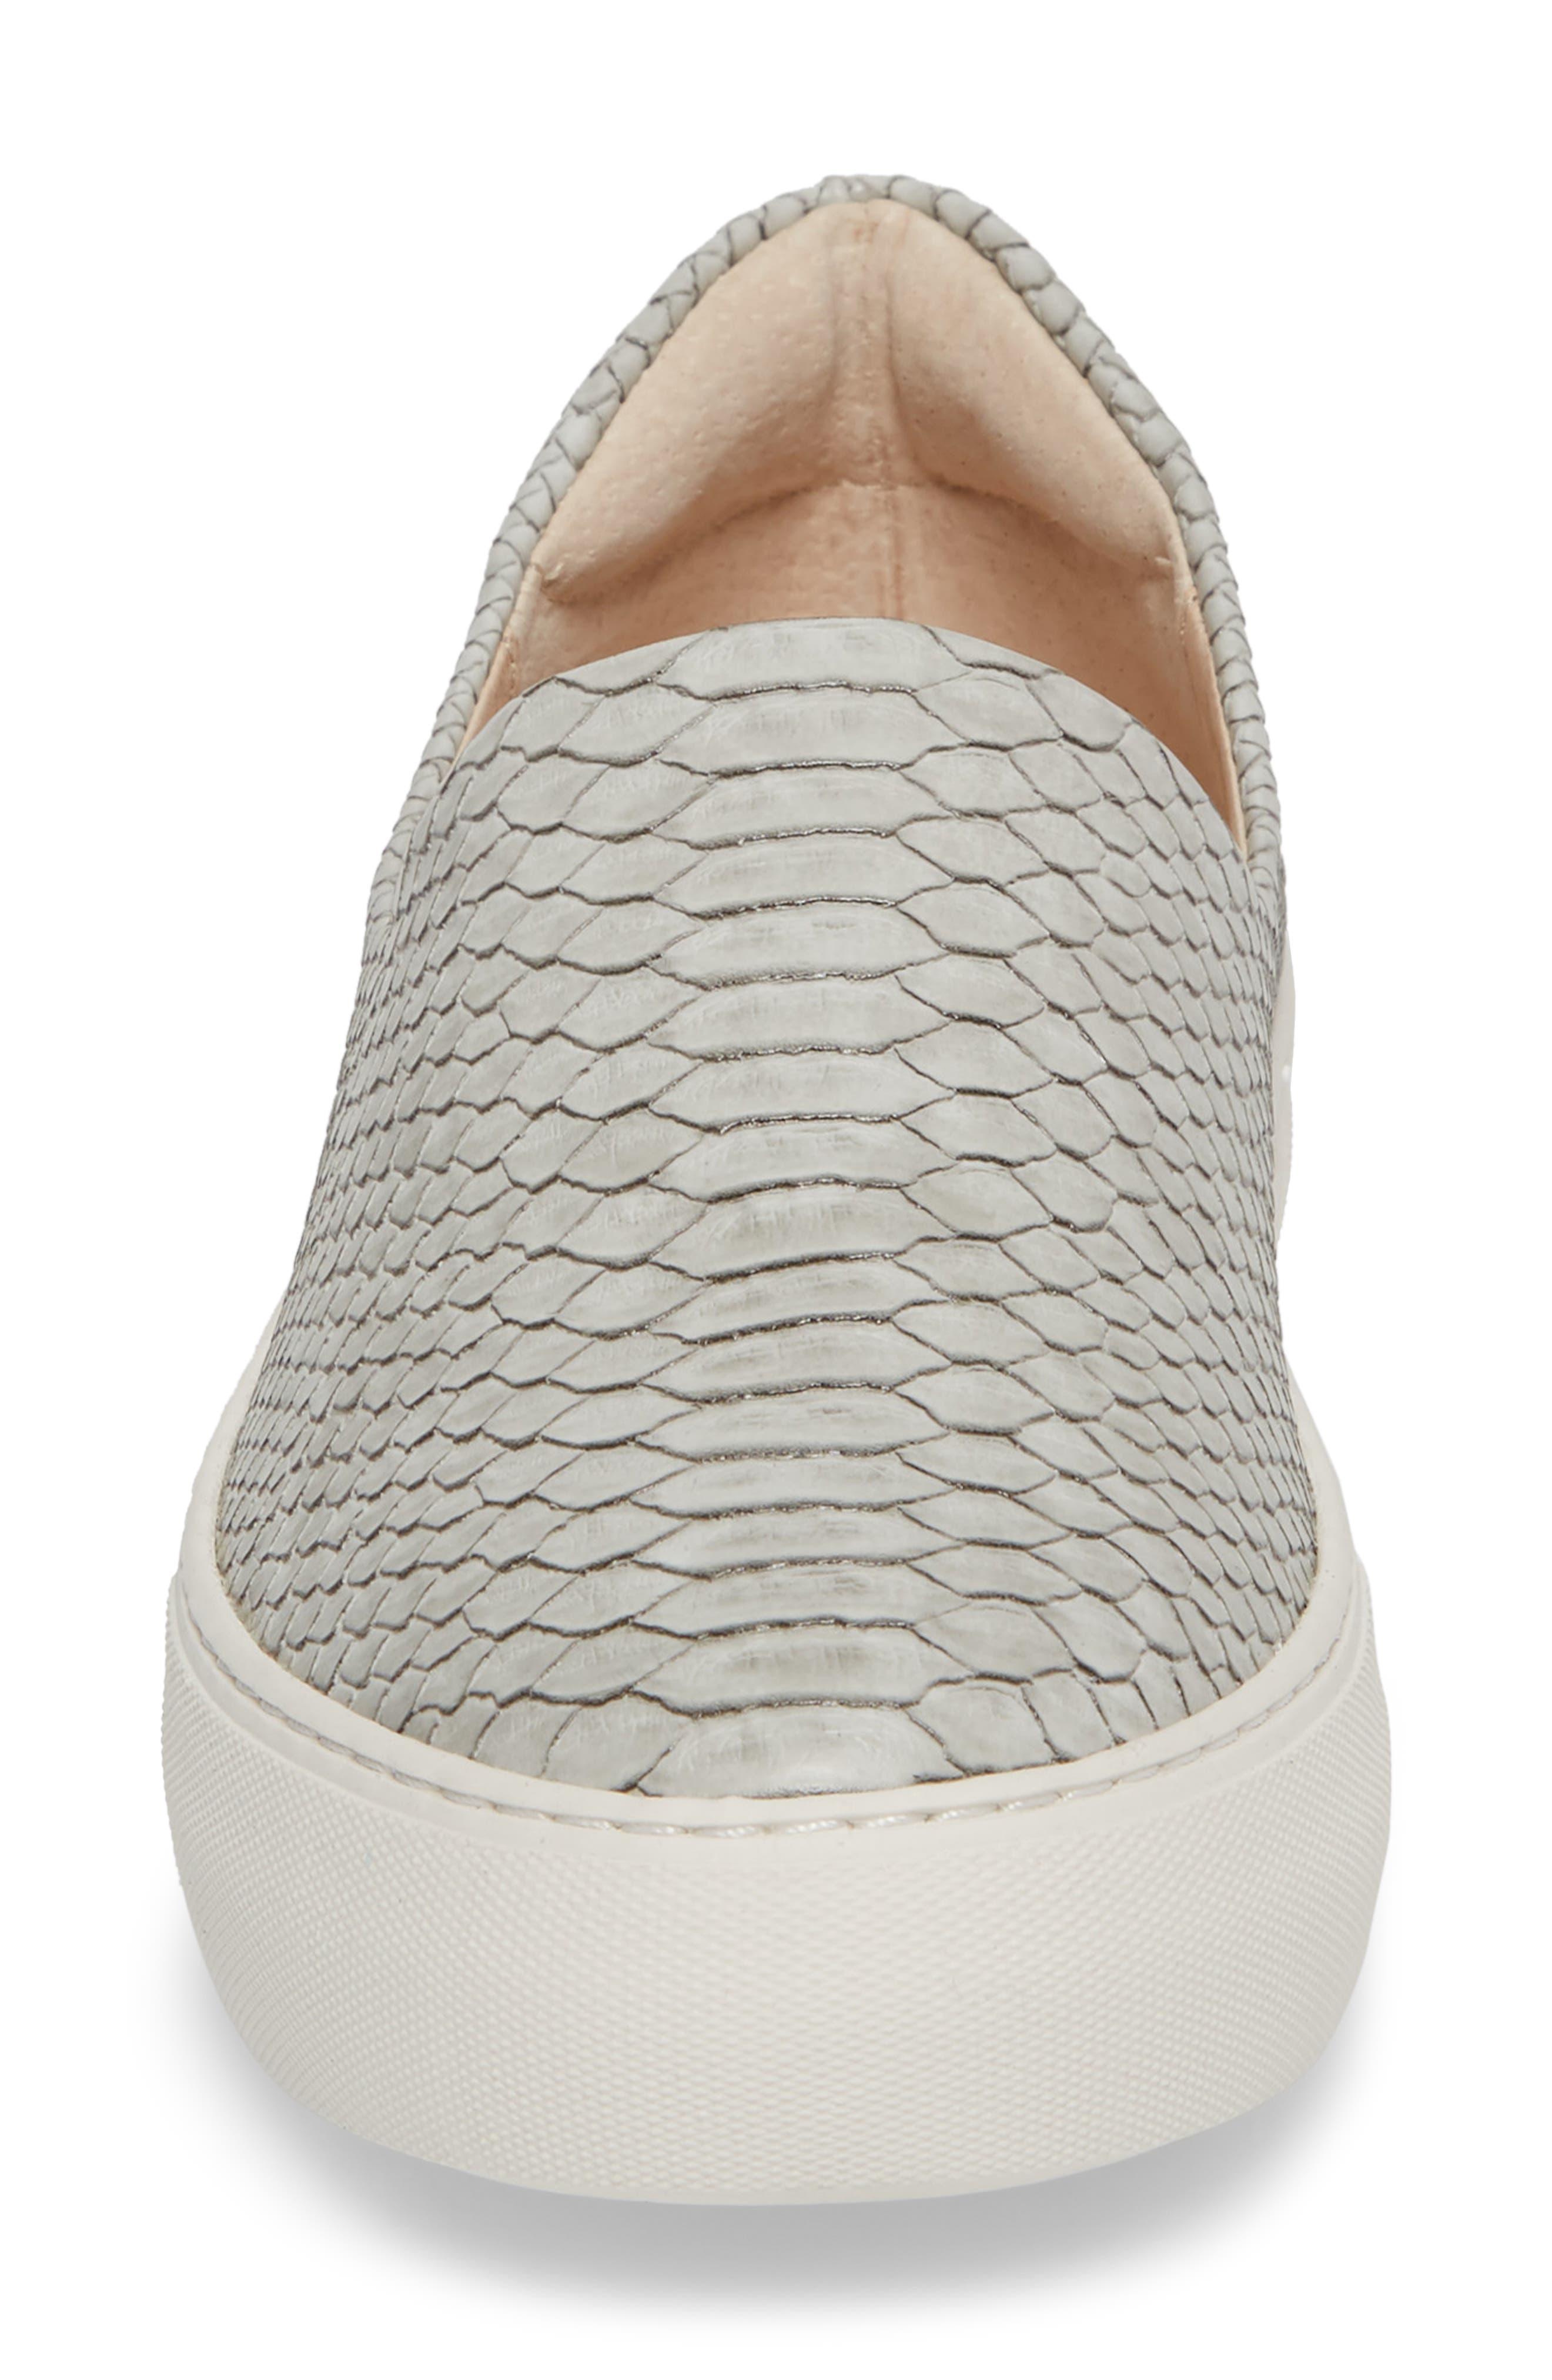 'Ariana' Platform Sneaker,                             Alternate thumbnail 4, color,                             LIGHT GREY EMBOSSED